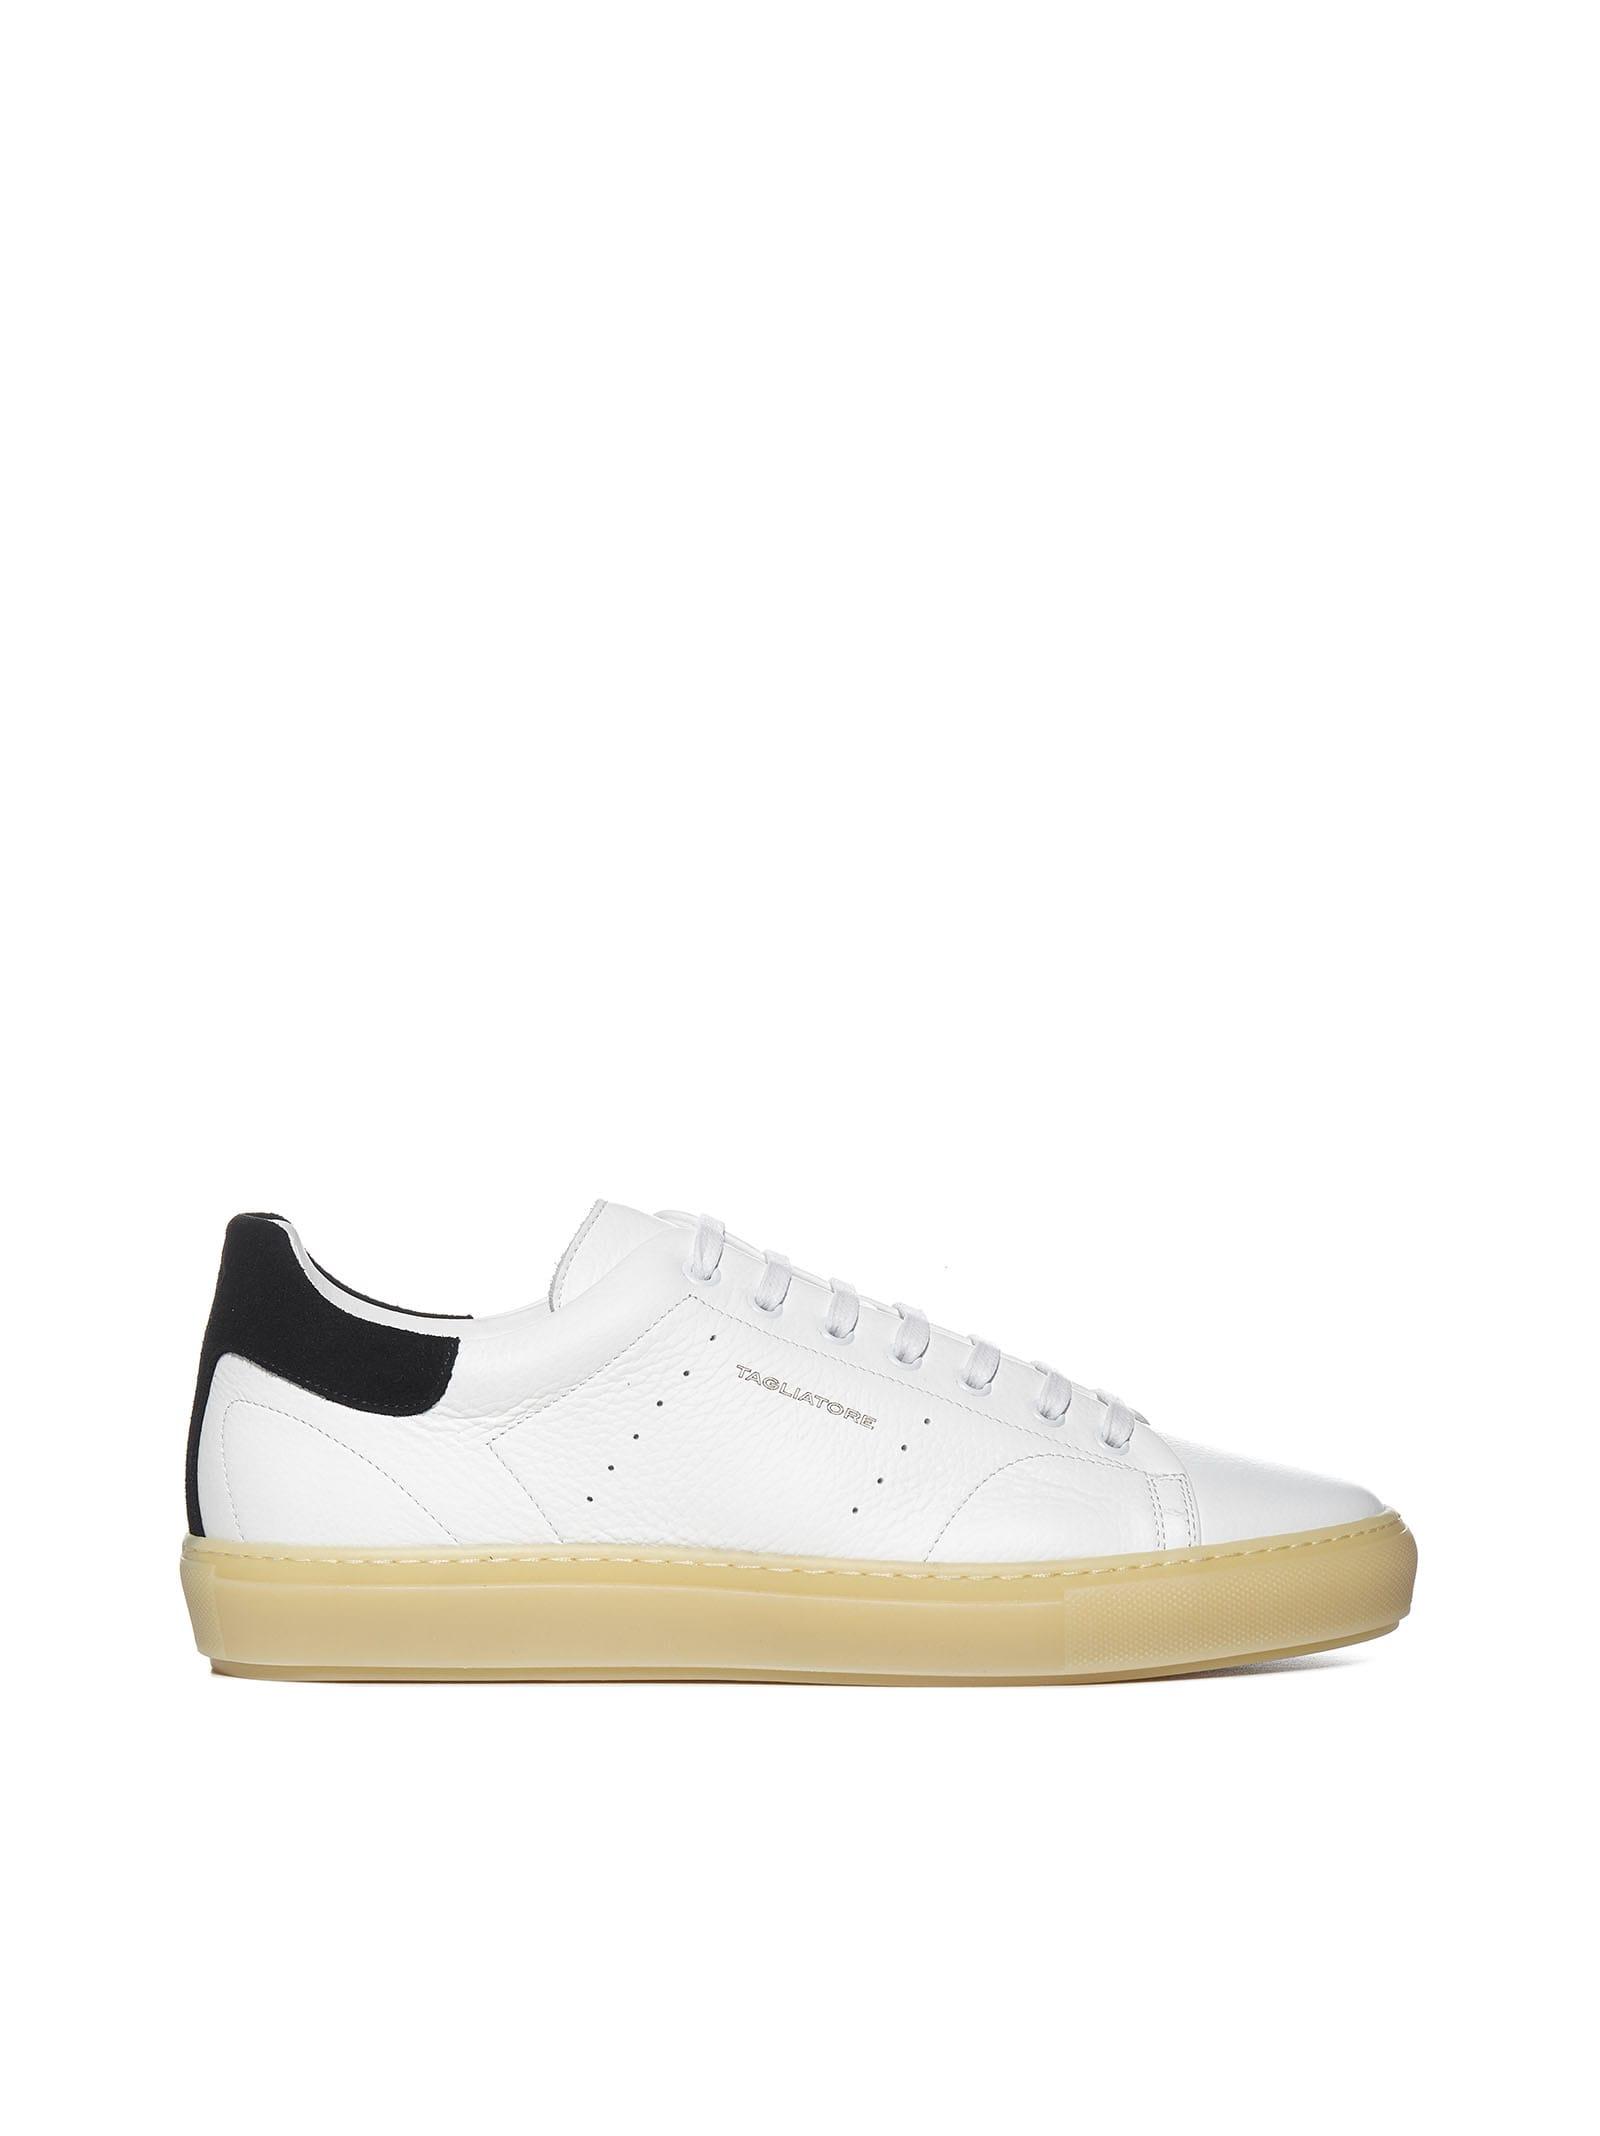 Tagliatore Sneakers SNEAKERS